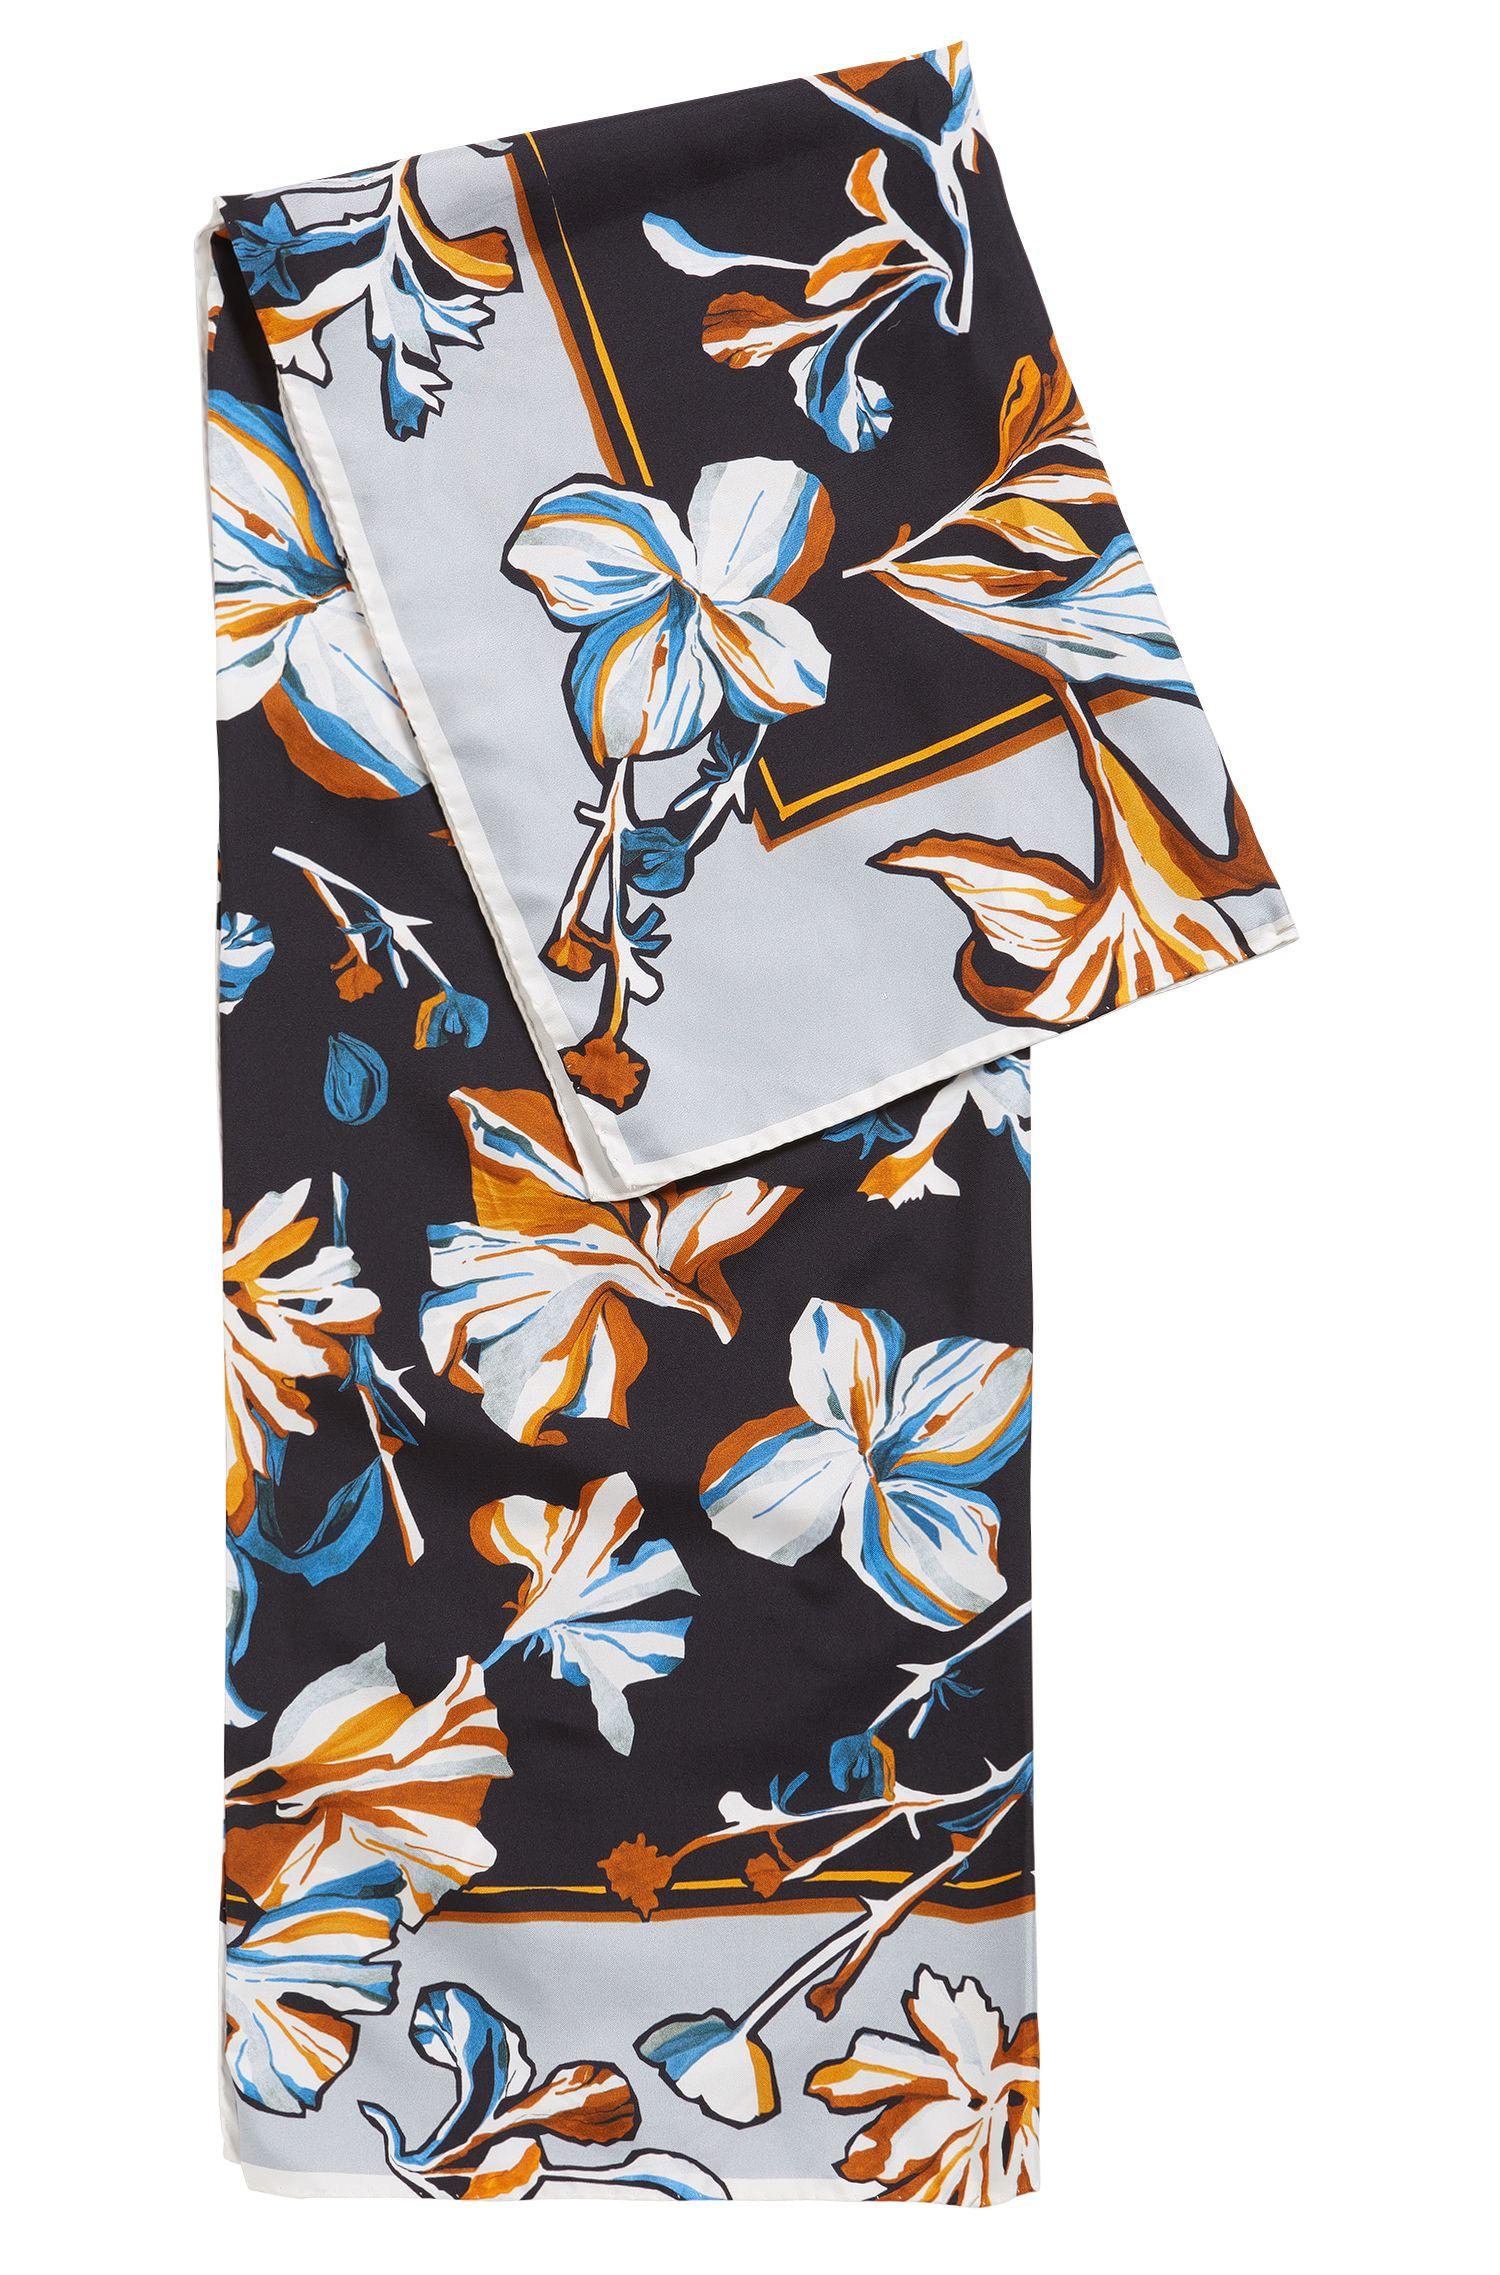 'Lorie' | Floral Silk Scarf